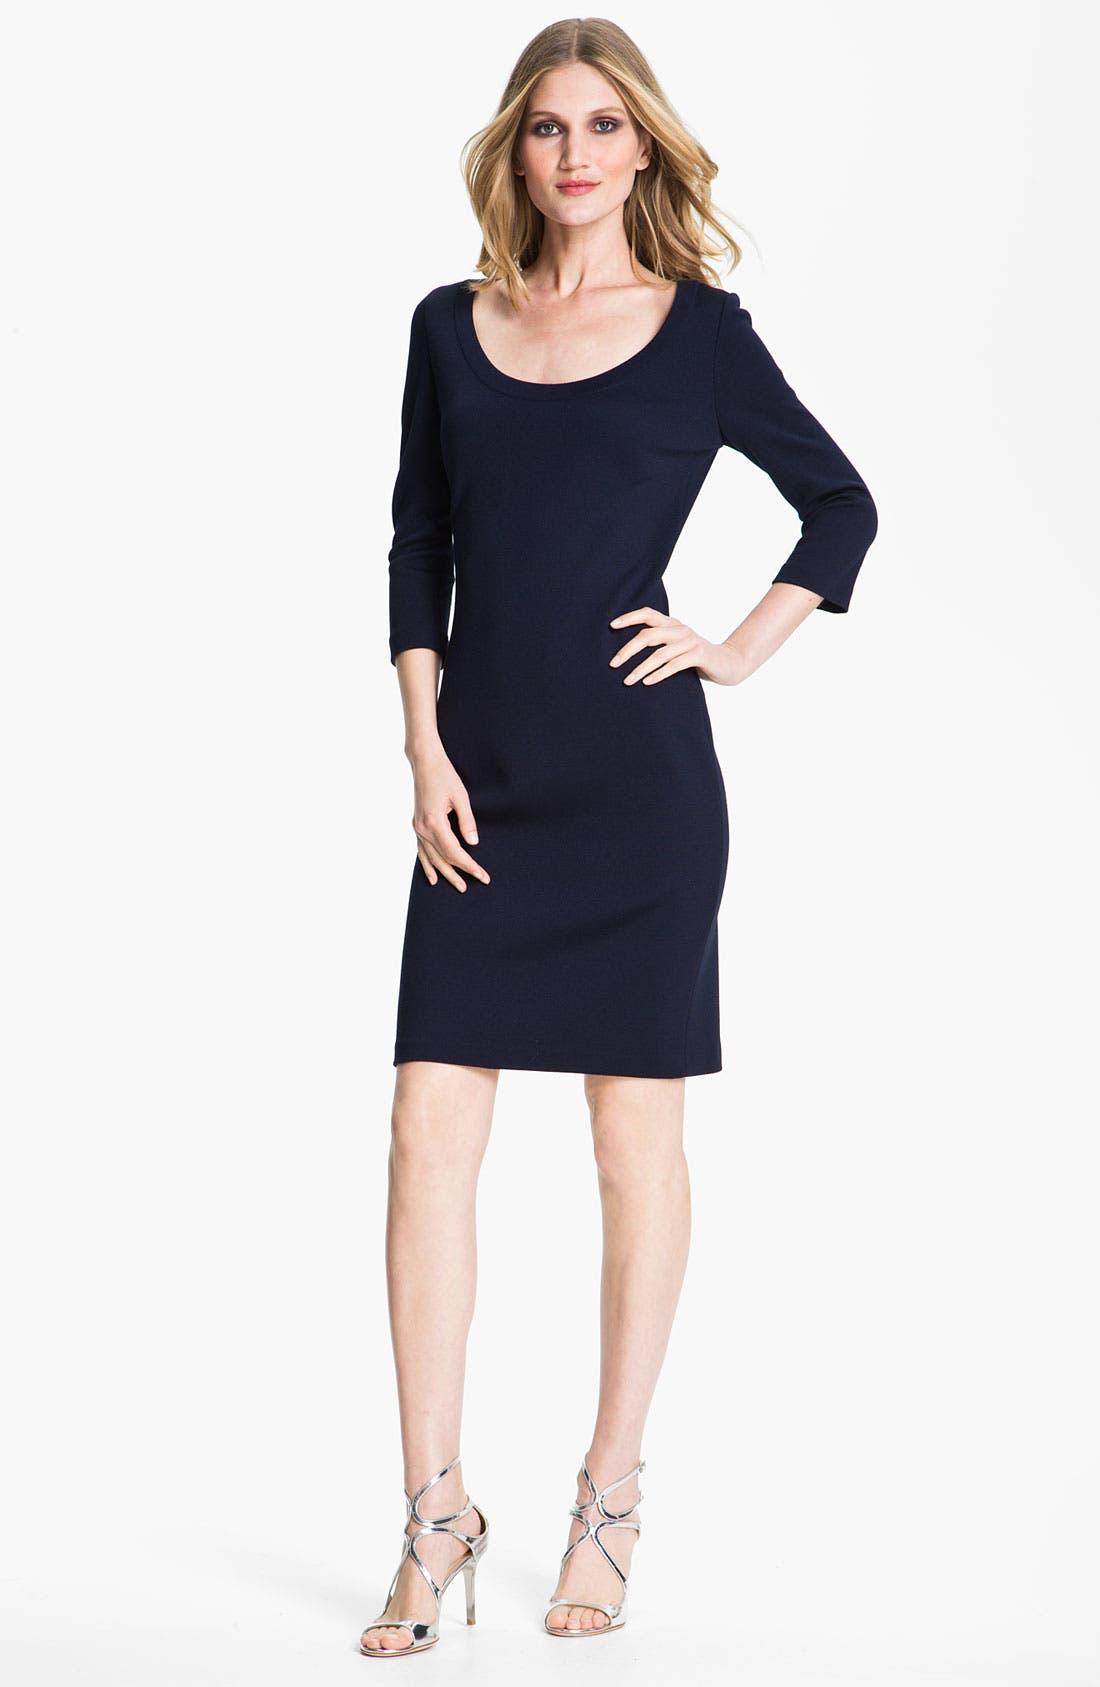 Main Image - St. John Collection Milano Knit Dress